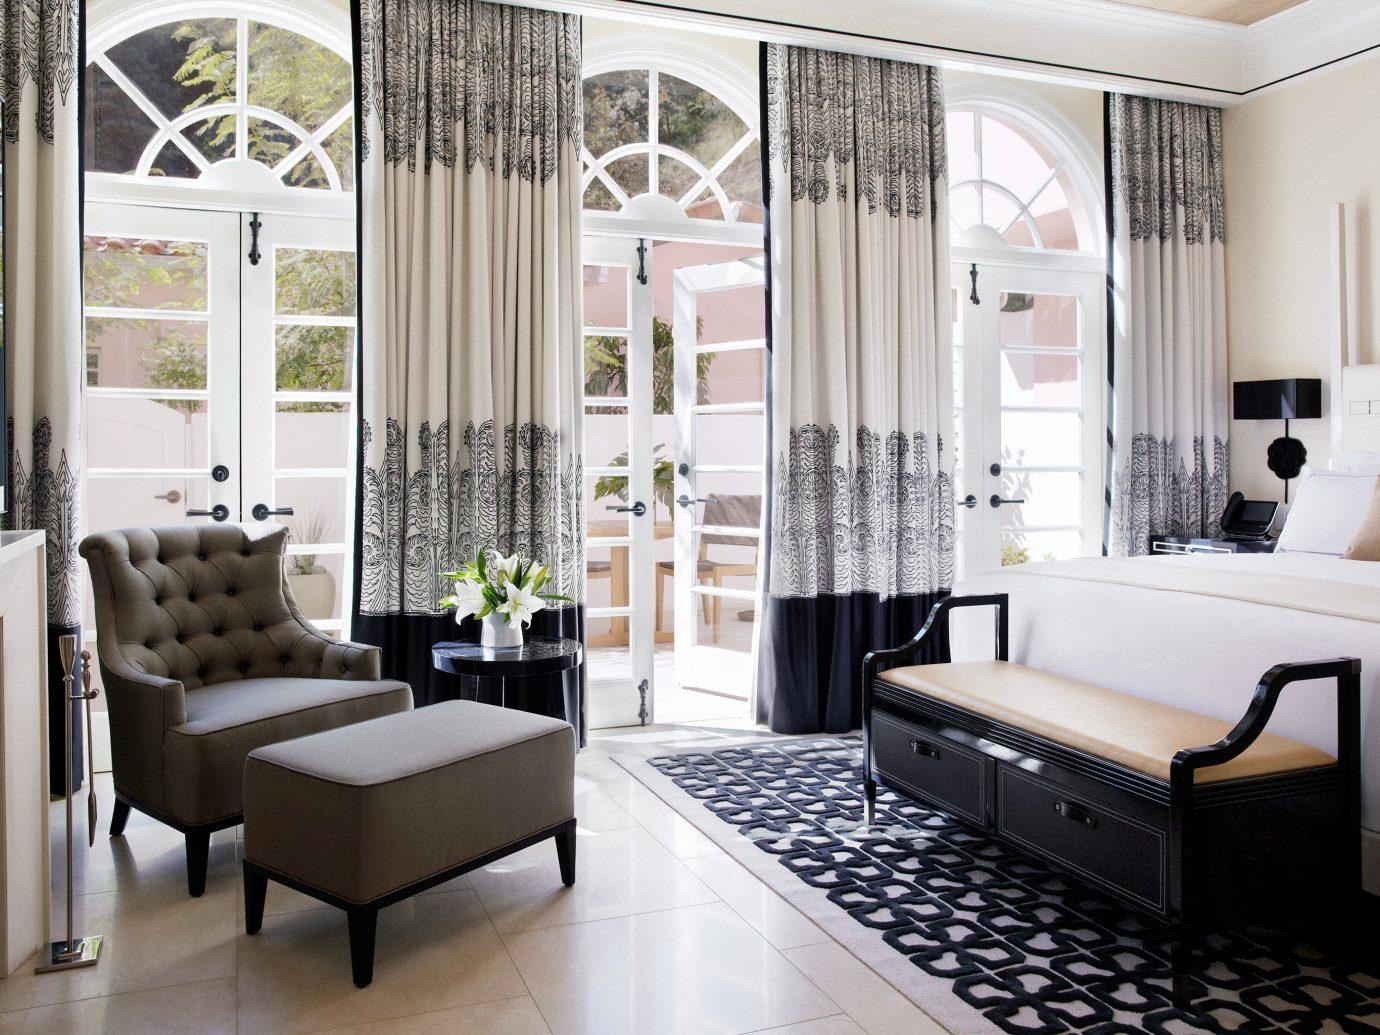 Bedroom Hotels Luxury Modern floor indoor window room property Living living room interior design home estate furniture Design real estate window covering Suite condominium curtain